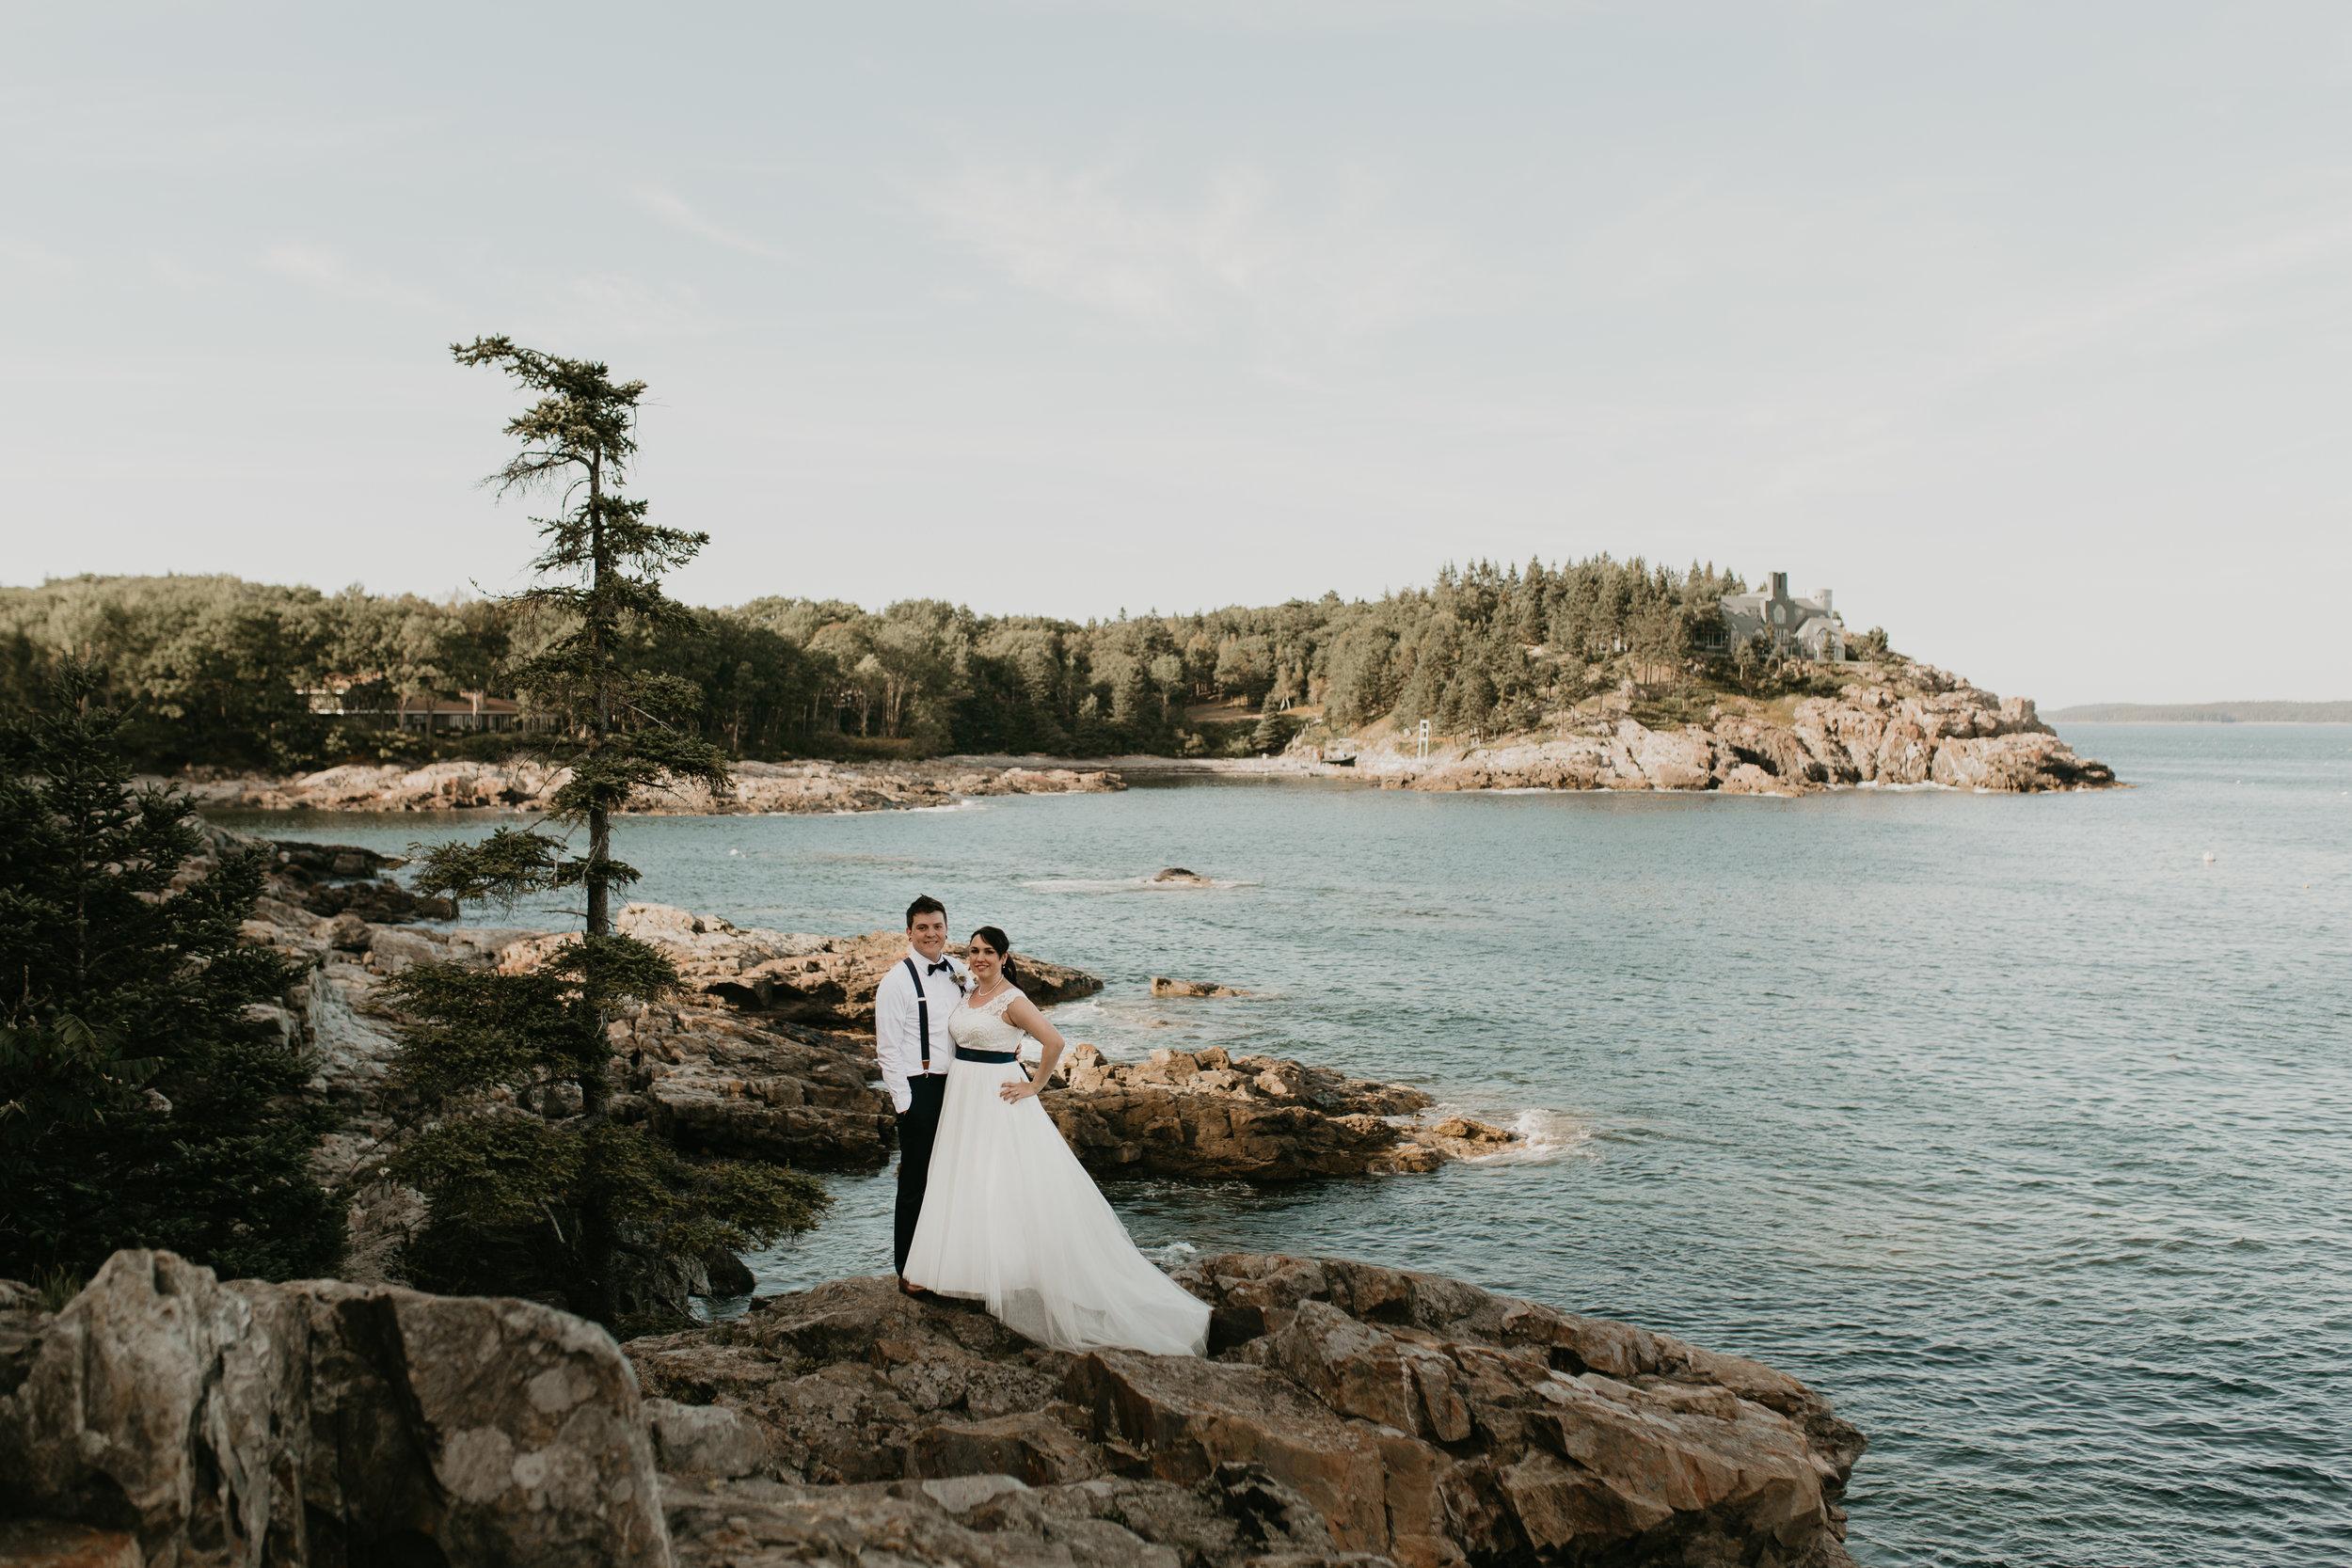 nicole-daacke-photography-Elopement-rocky-shoreline-coast-Acadia-National-Park-elopement-photographer-inspiration-maine-elopement-otter-cliffs-schoonic-head-point-32.jpg